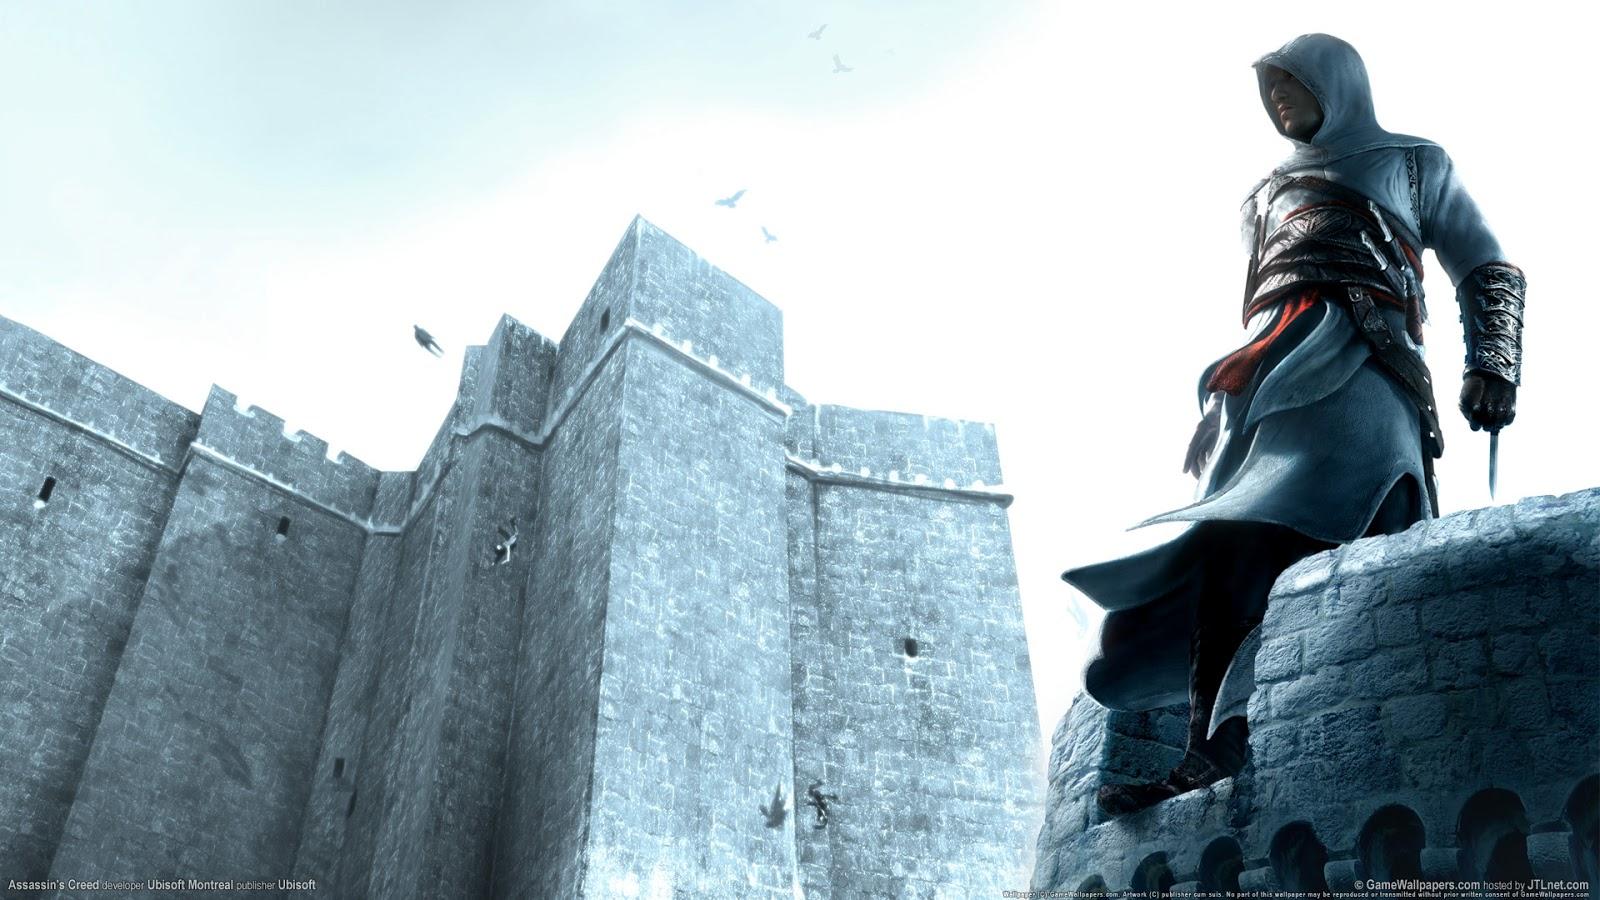 HD Desktop Wallpapers Assassins Creed Brotherhood Game Wallpapers HD 1600x900